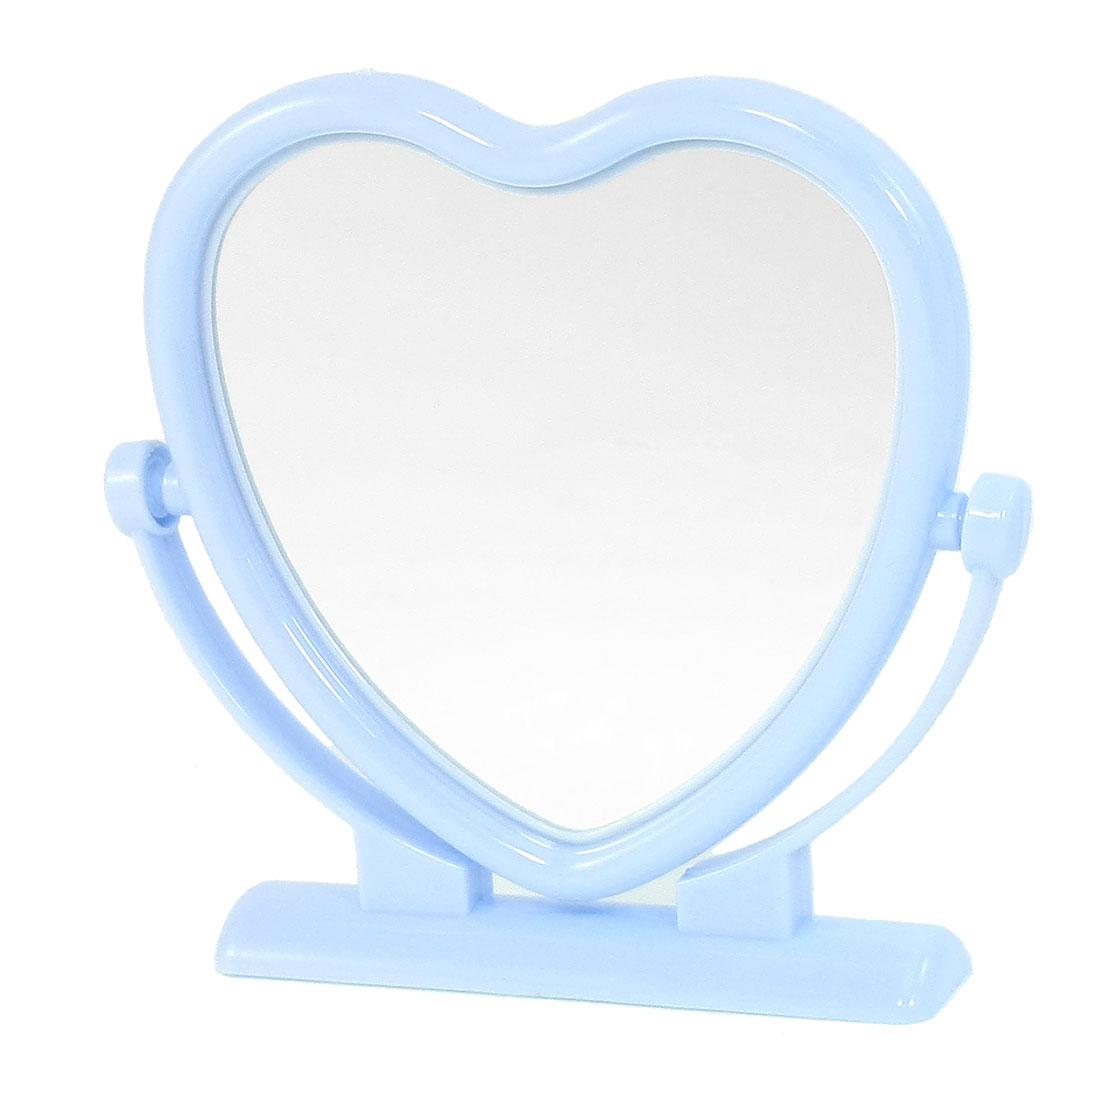 Sky Blue Plastic Frame Heart Shaped Butterfly Print Desktop Cosmetic Mirror